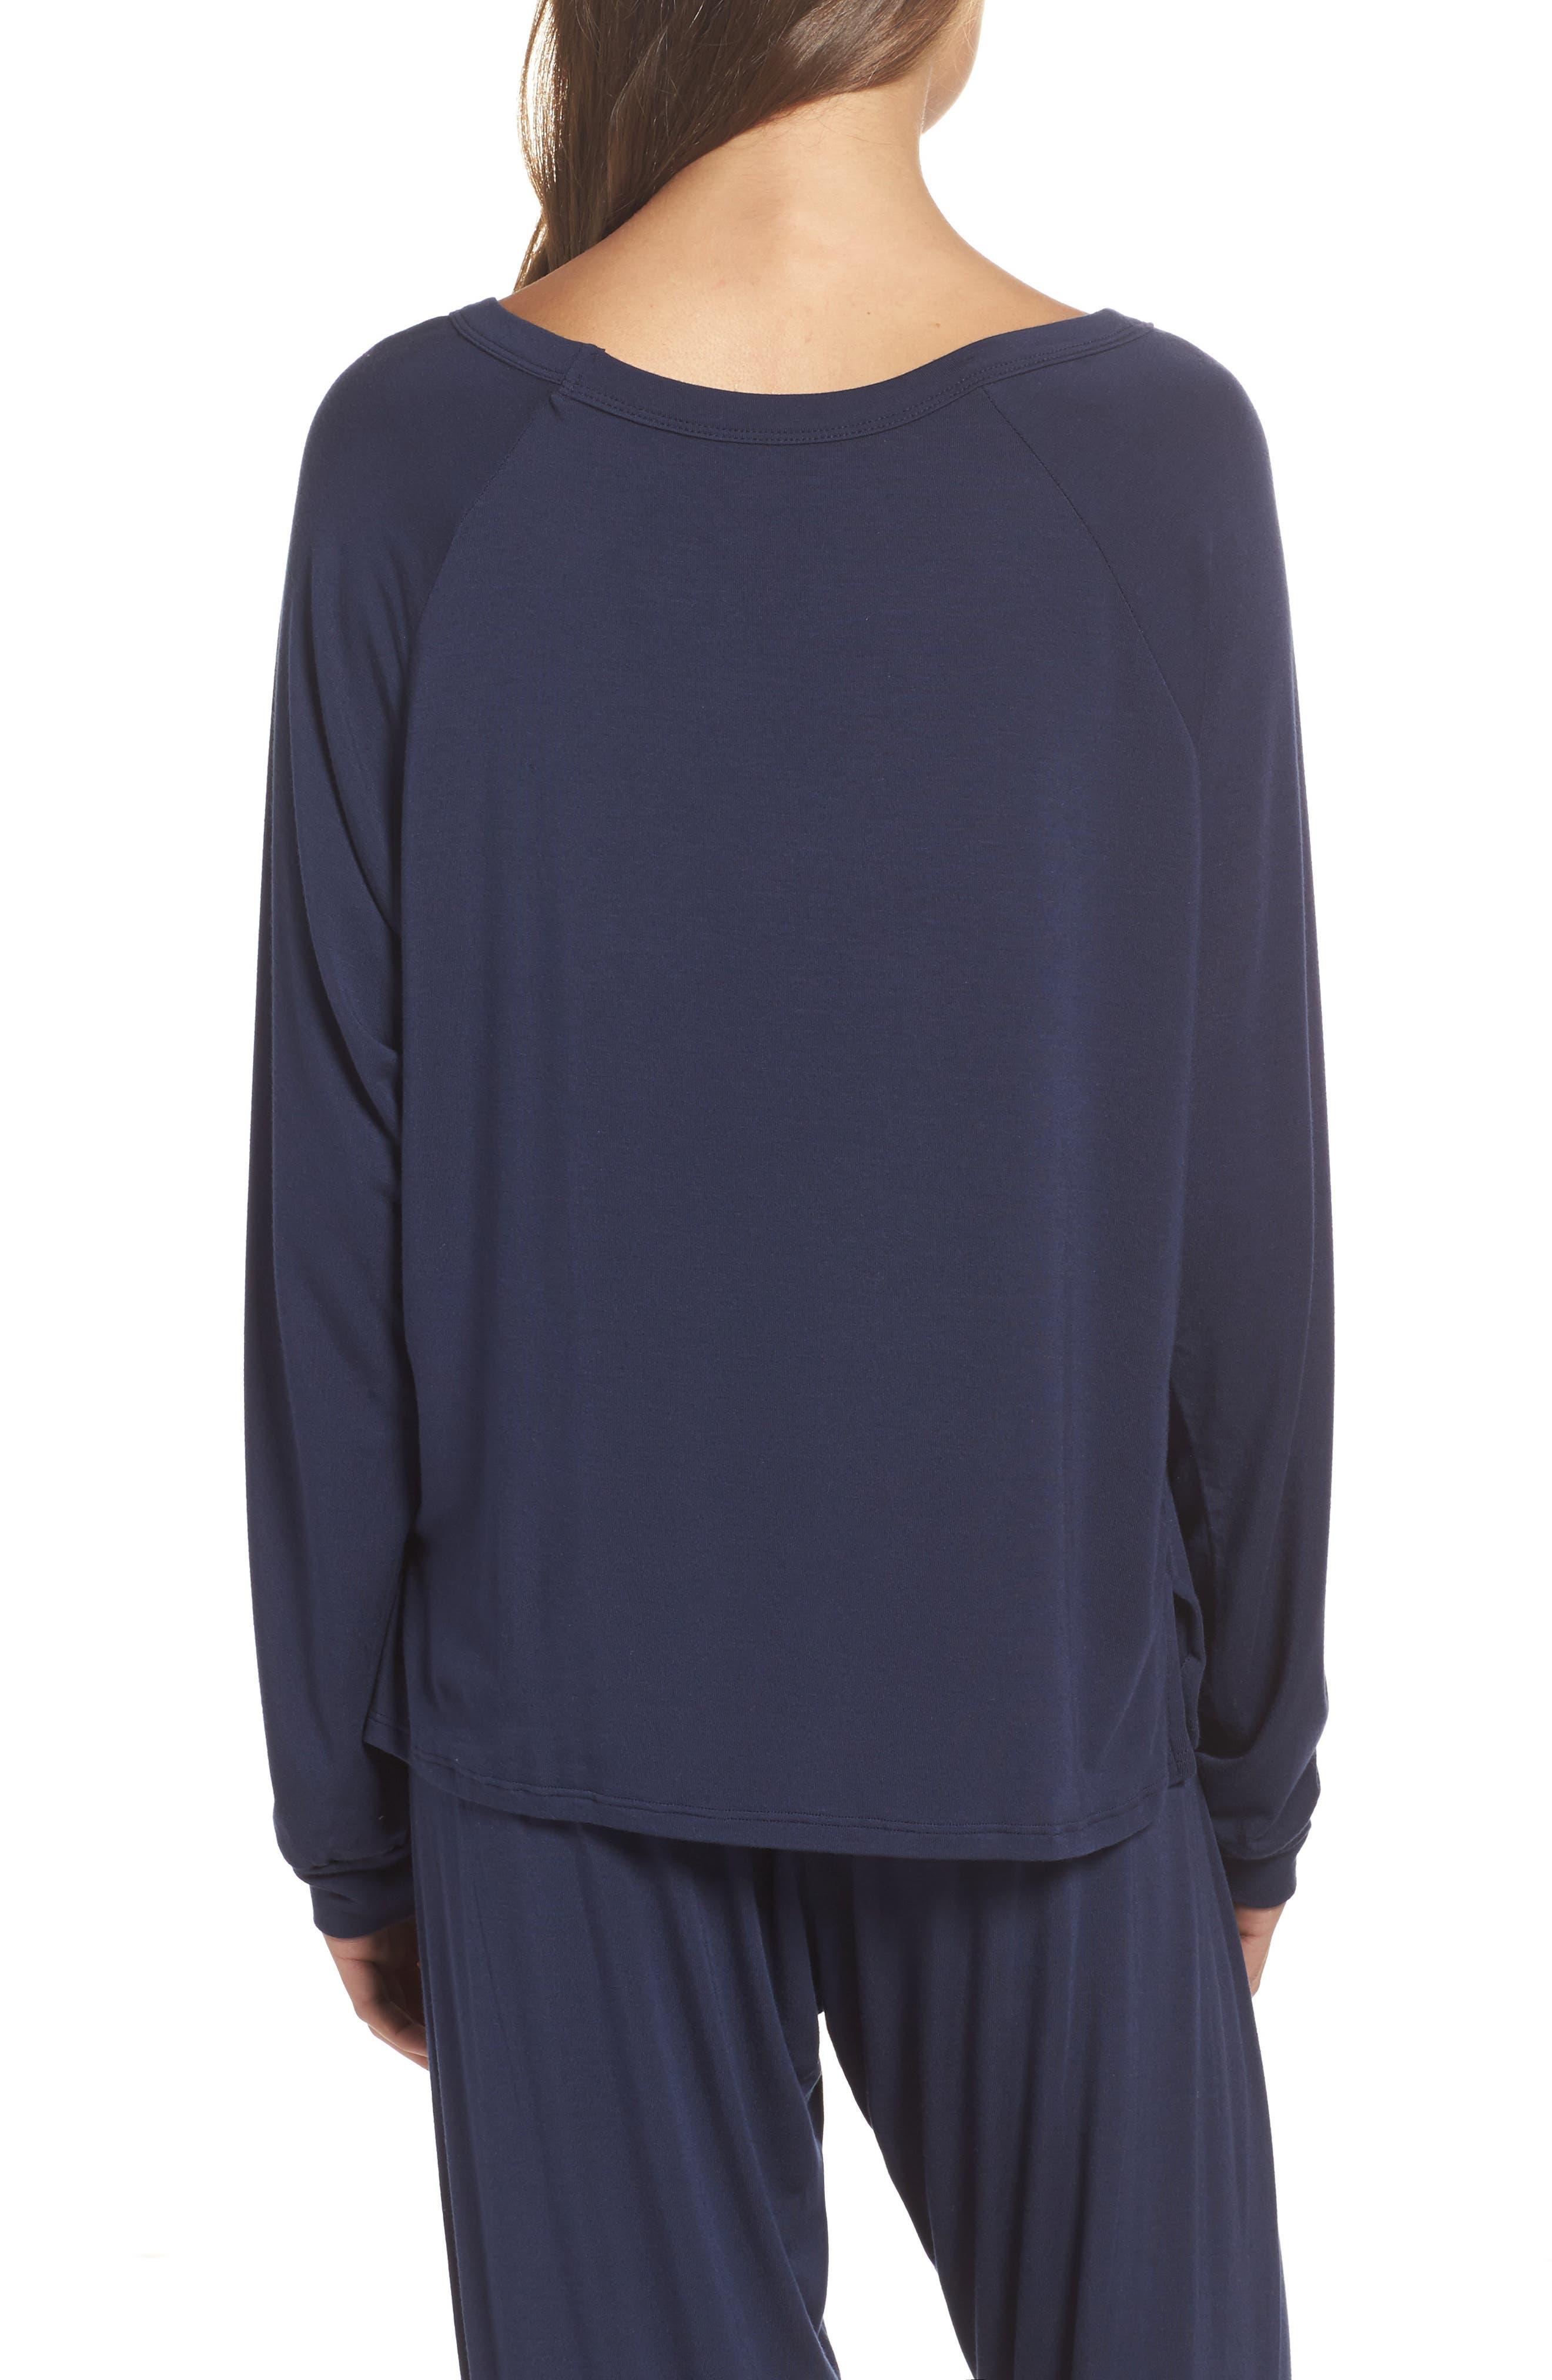 Amber Long Sleeve Top,                             Alternate thumbnail 2, color,